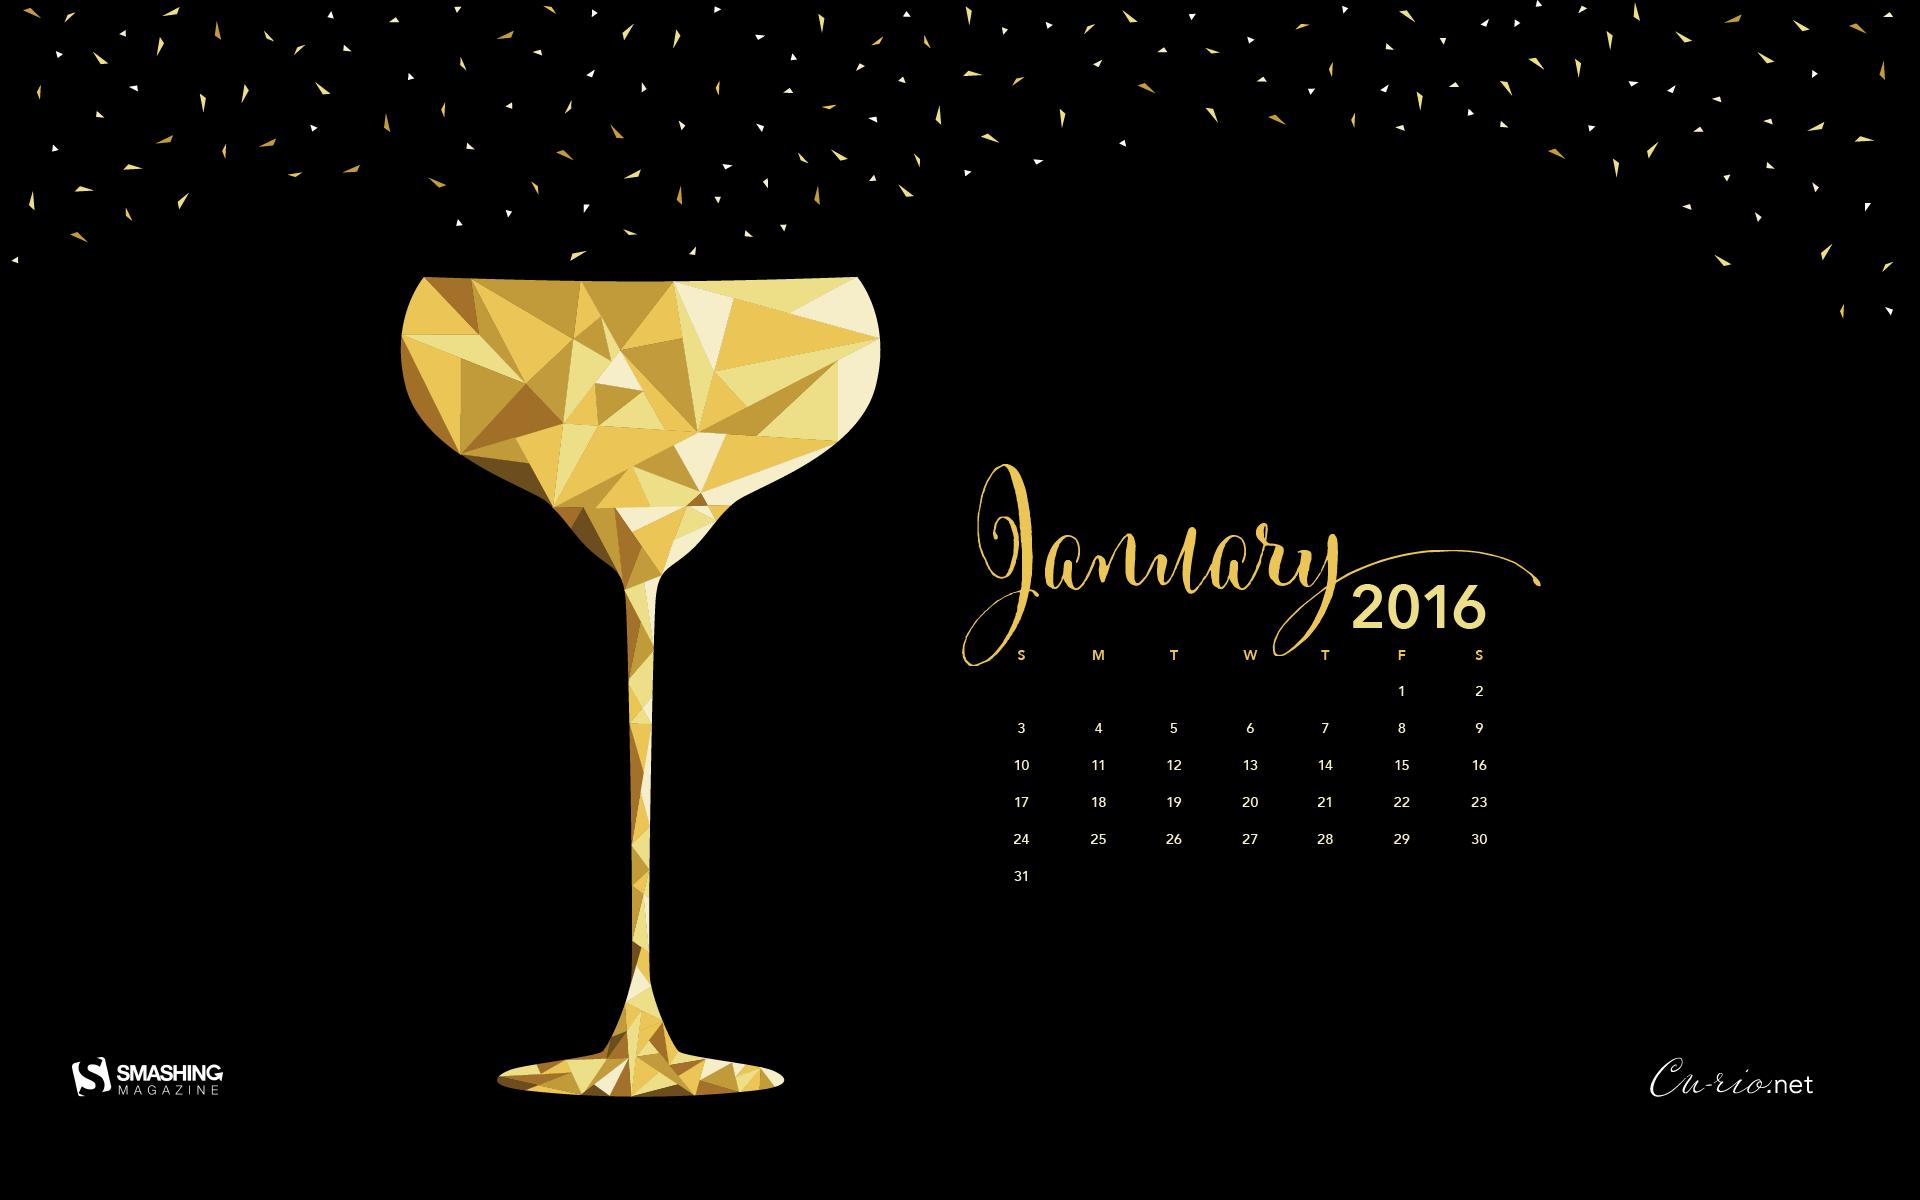 Desktop Wallpaper Calendars: January 2016 – Smashing Magazine